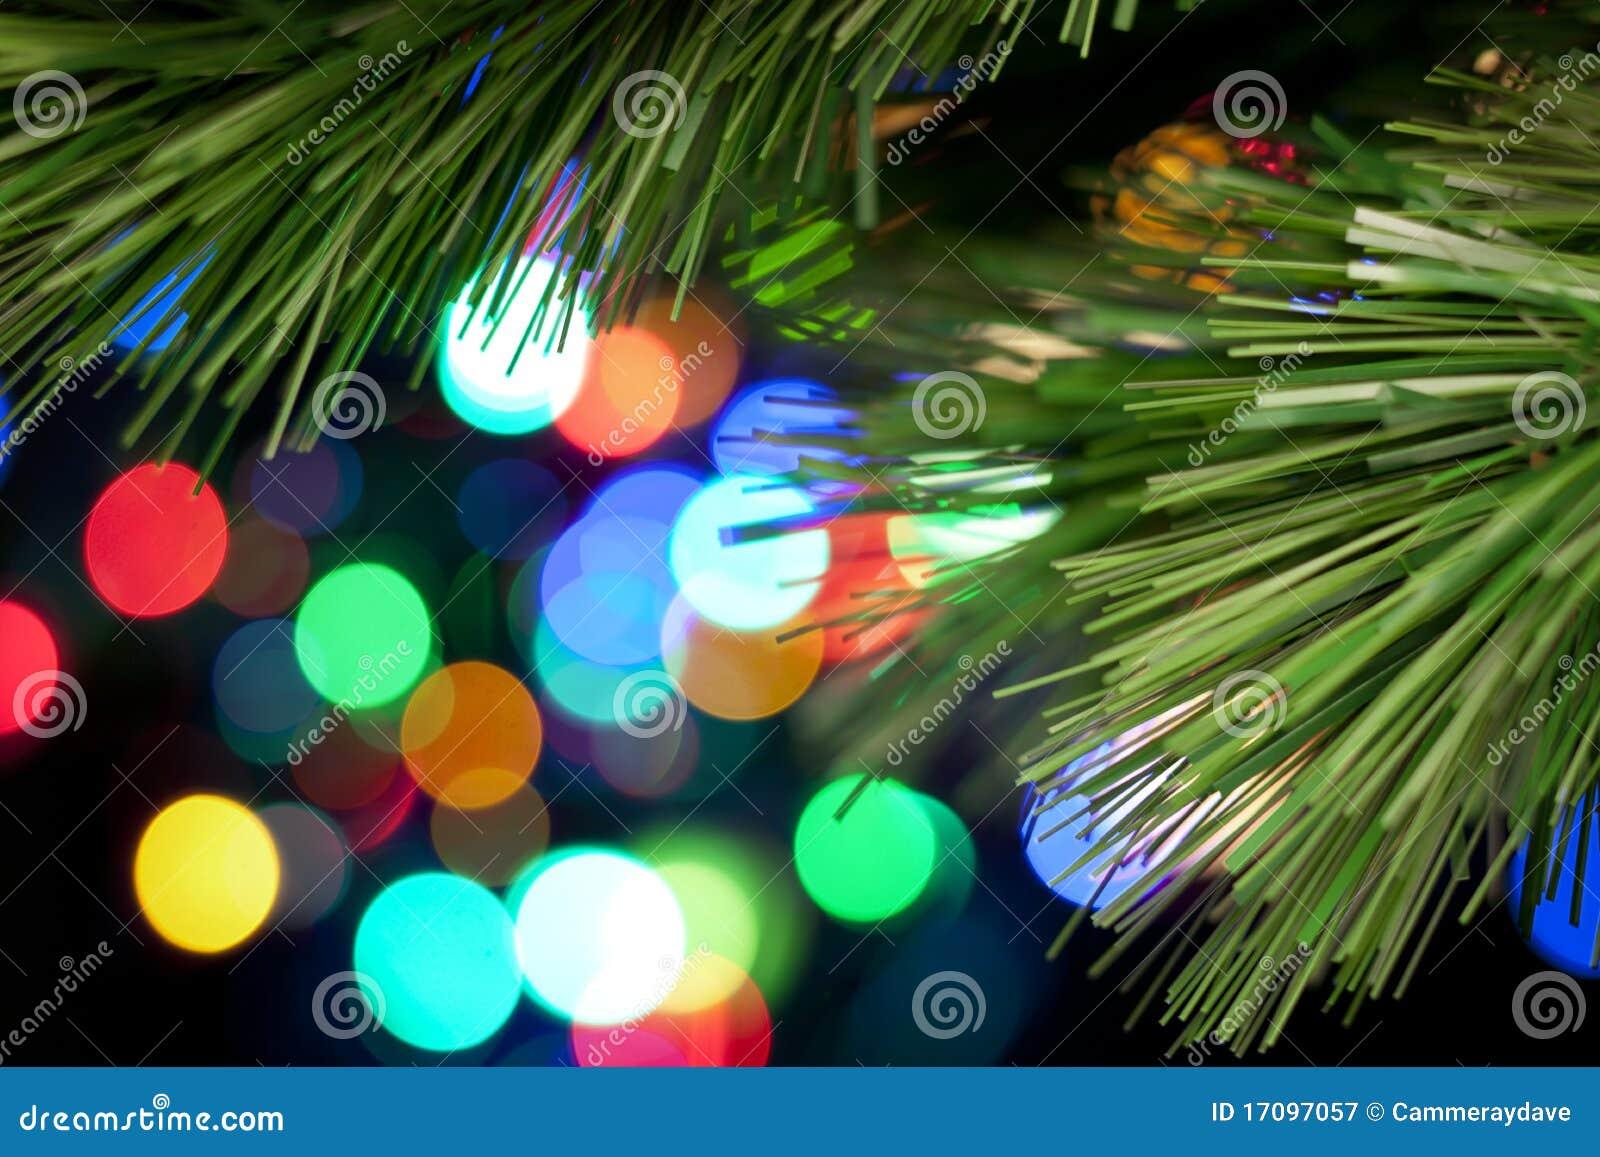 Christmas tree lights background stock image